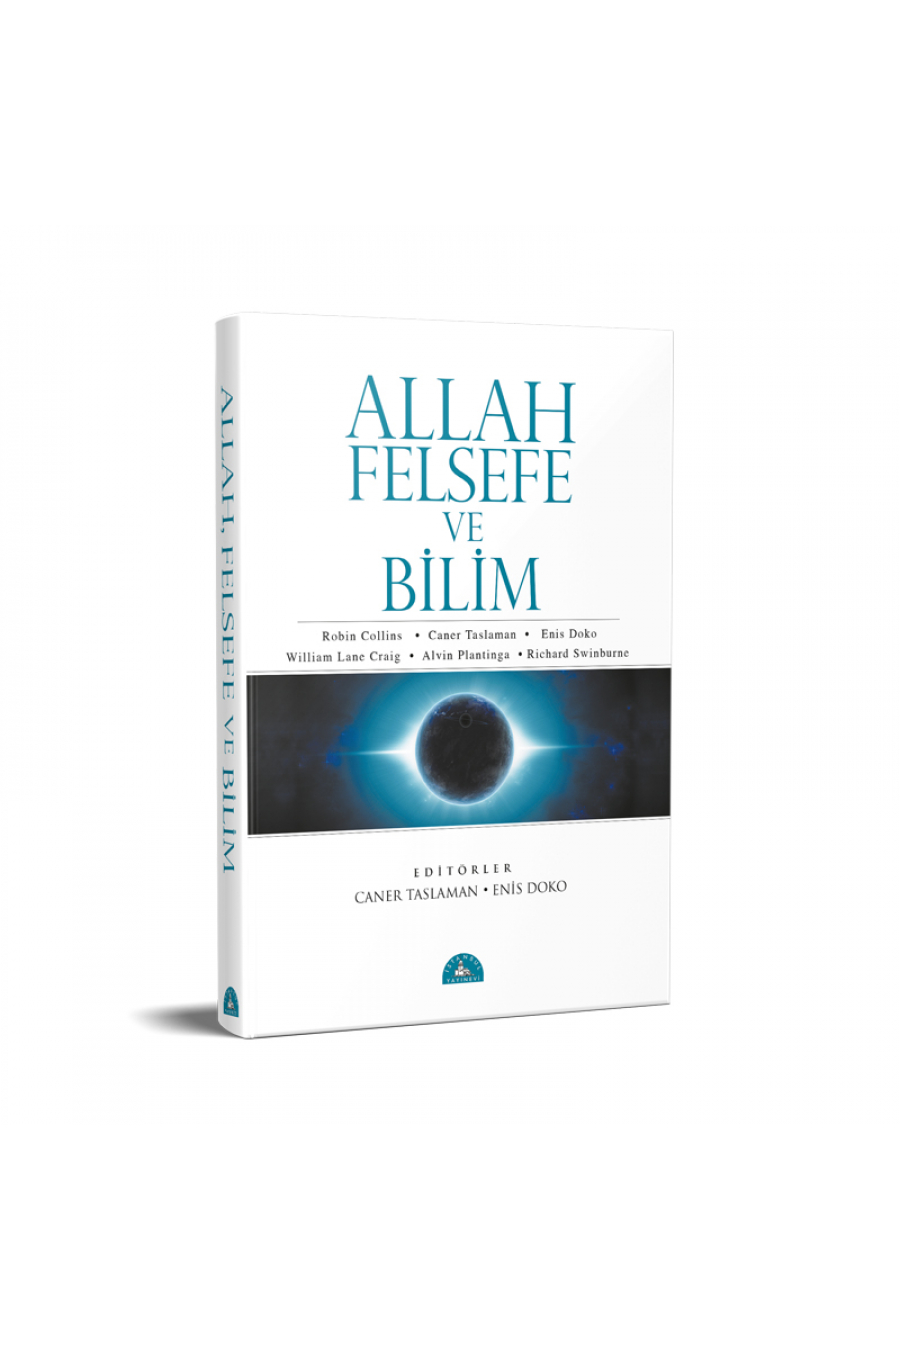 Allah Felsefe ve Bilim